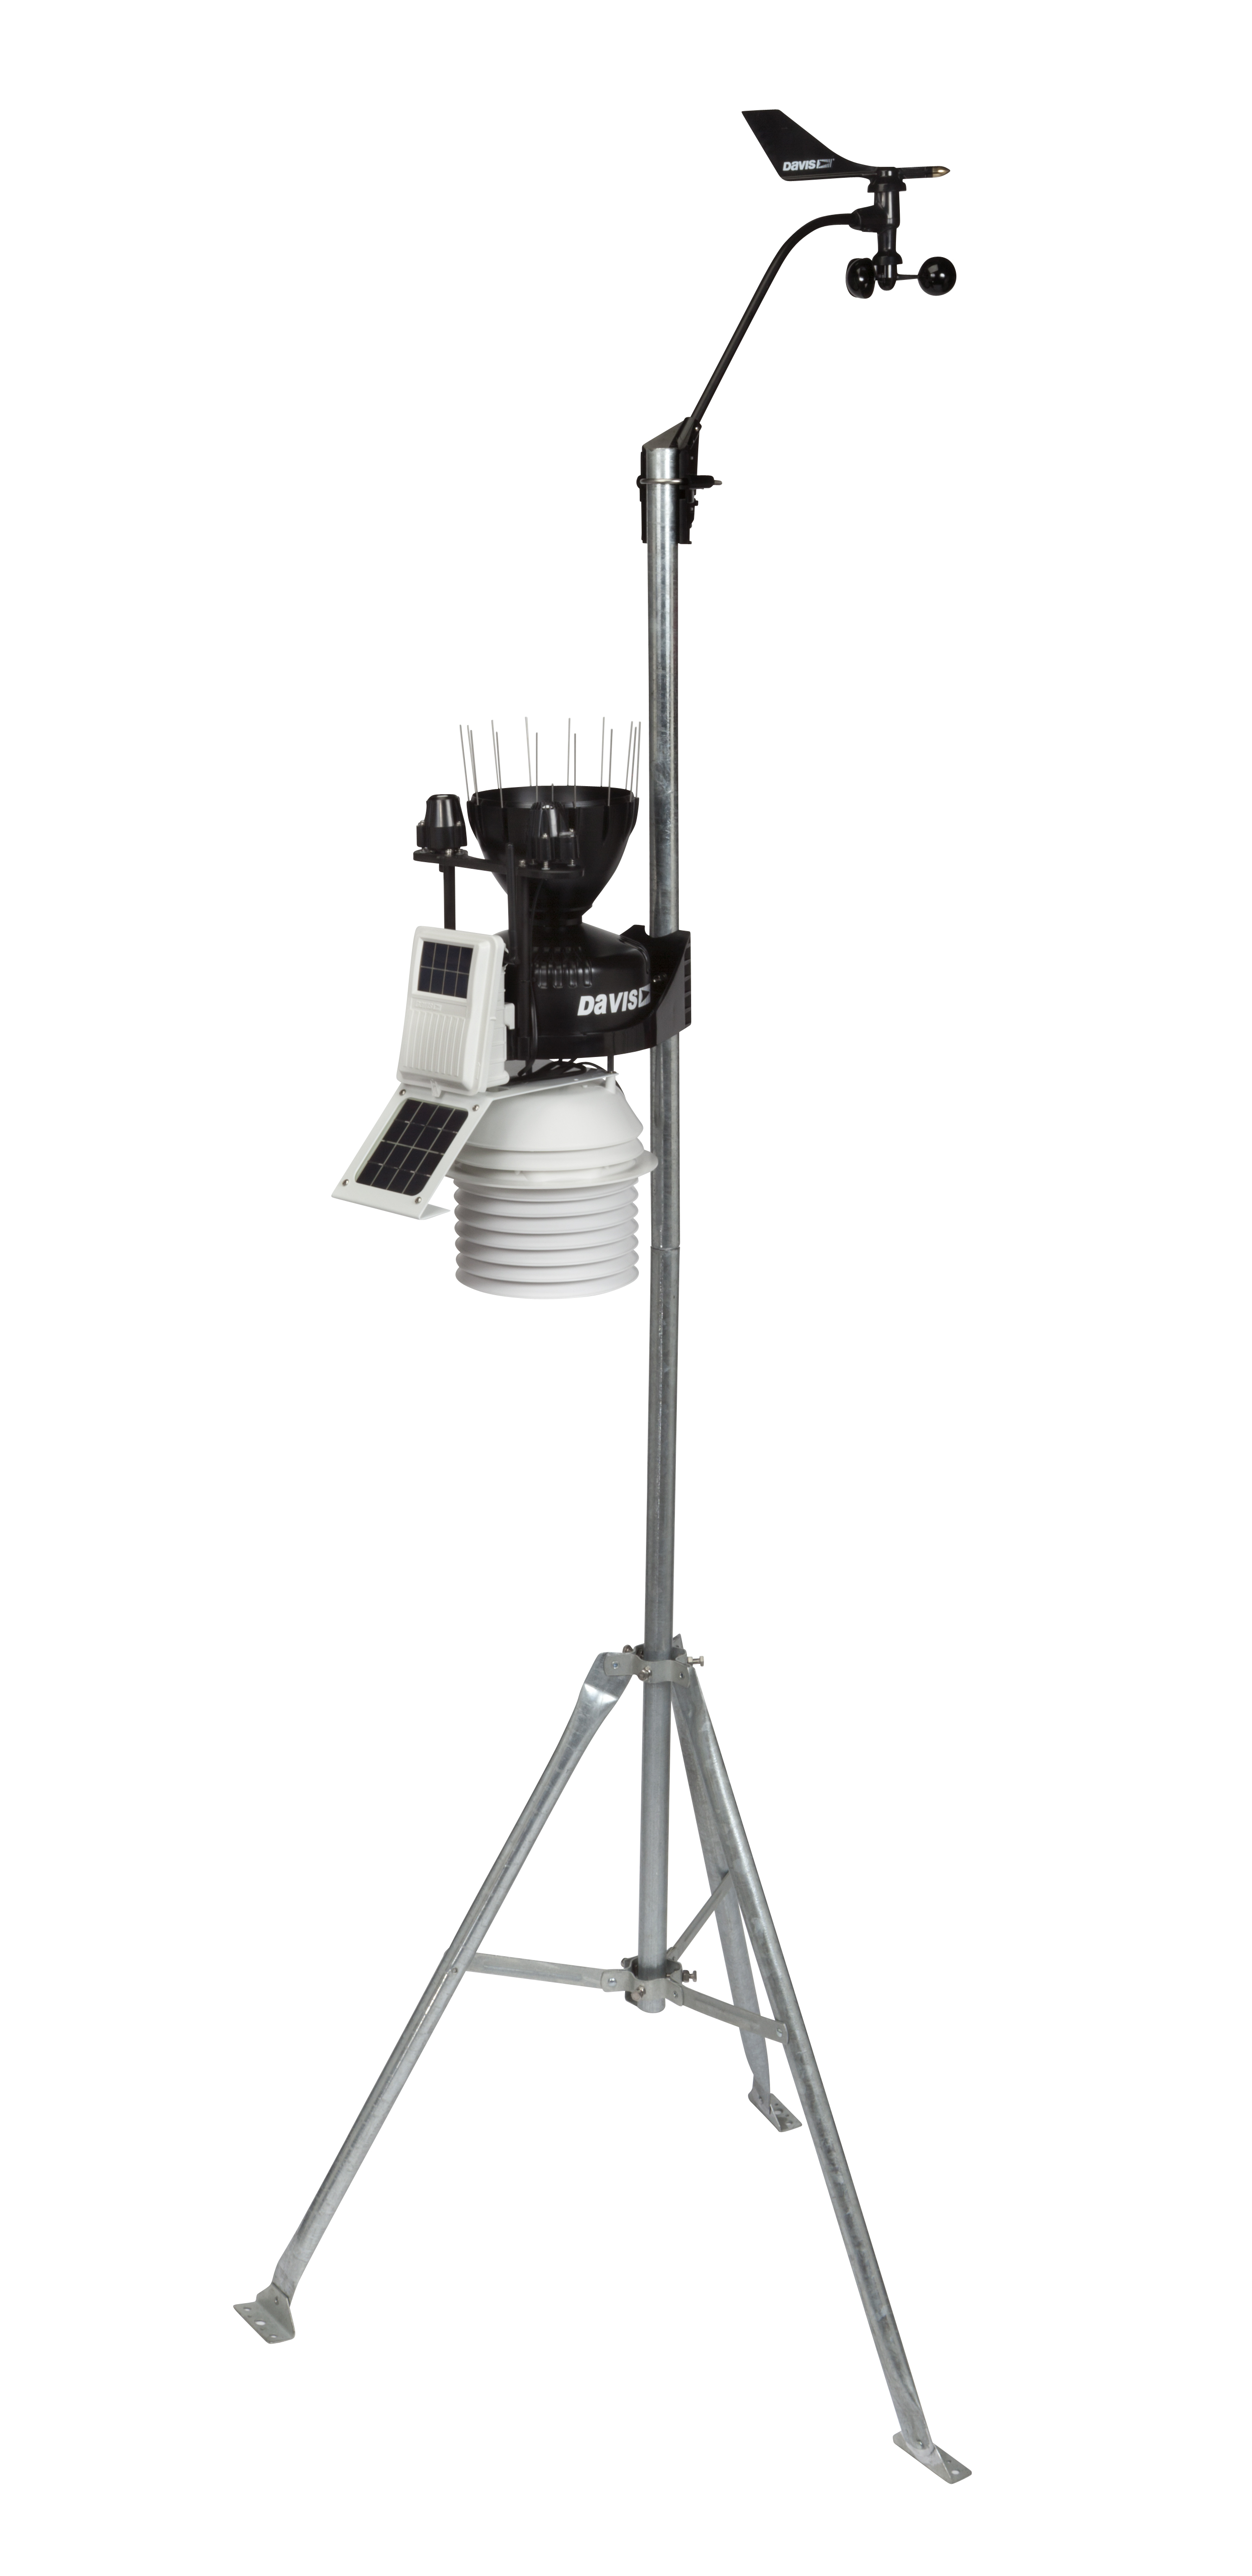 davis instruments 6163 wireless vantage pro2 plus with 24